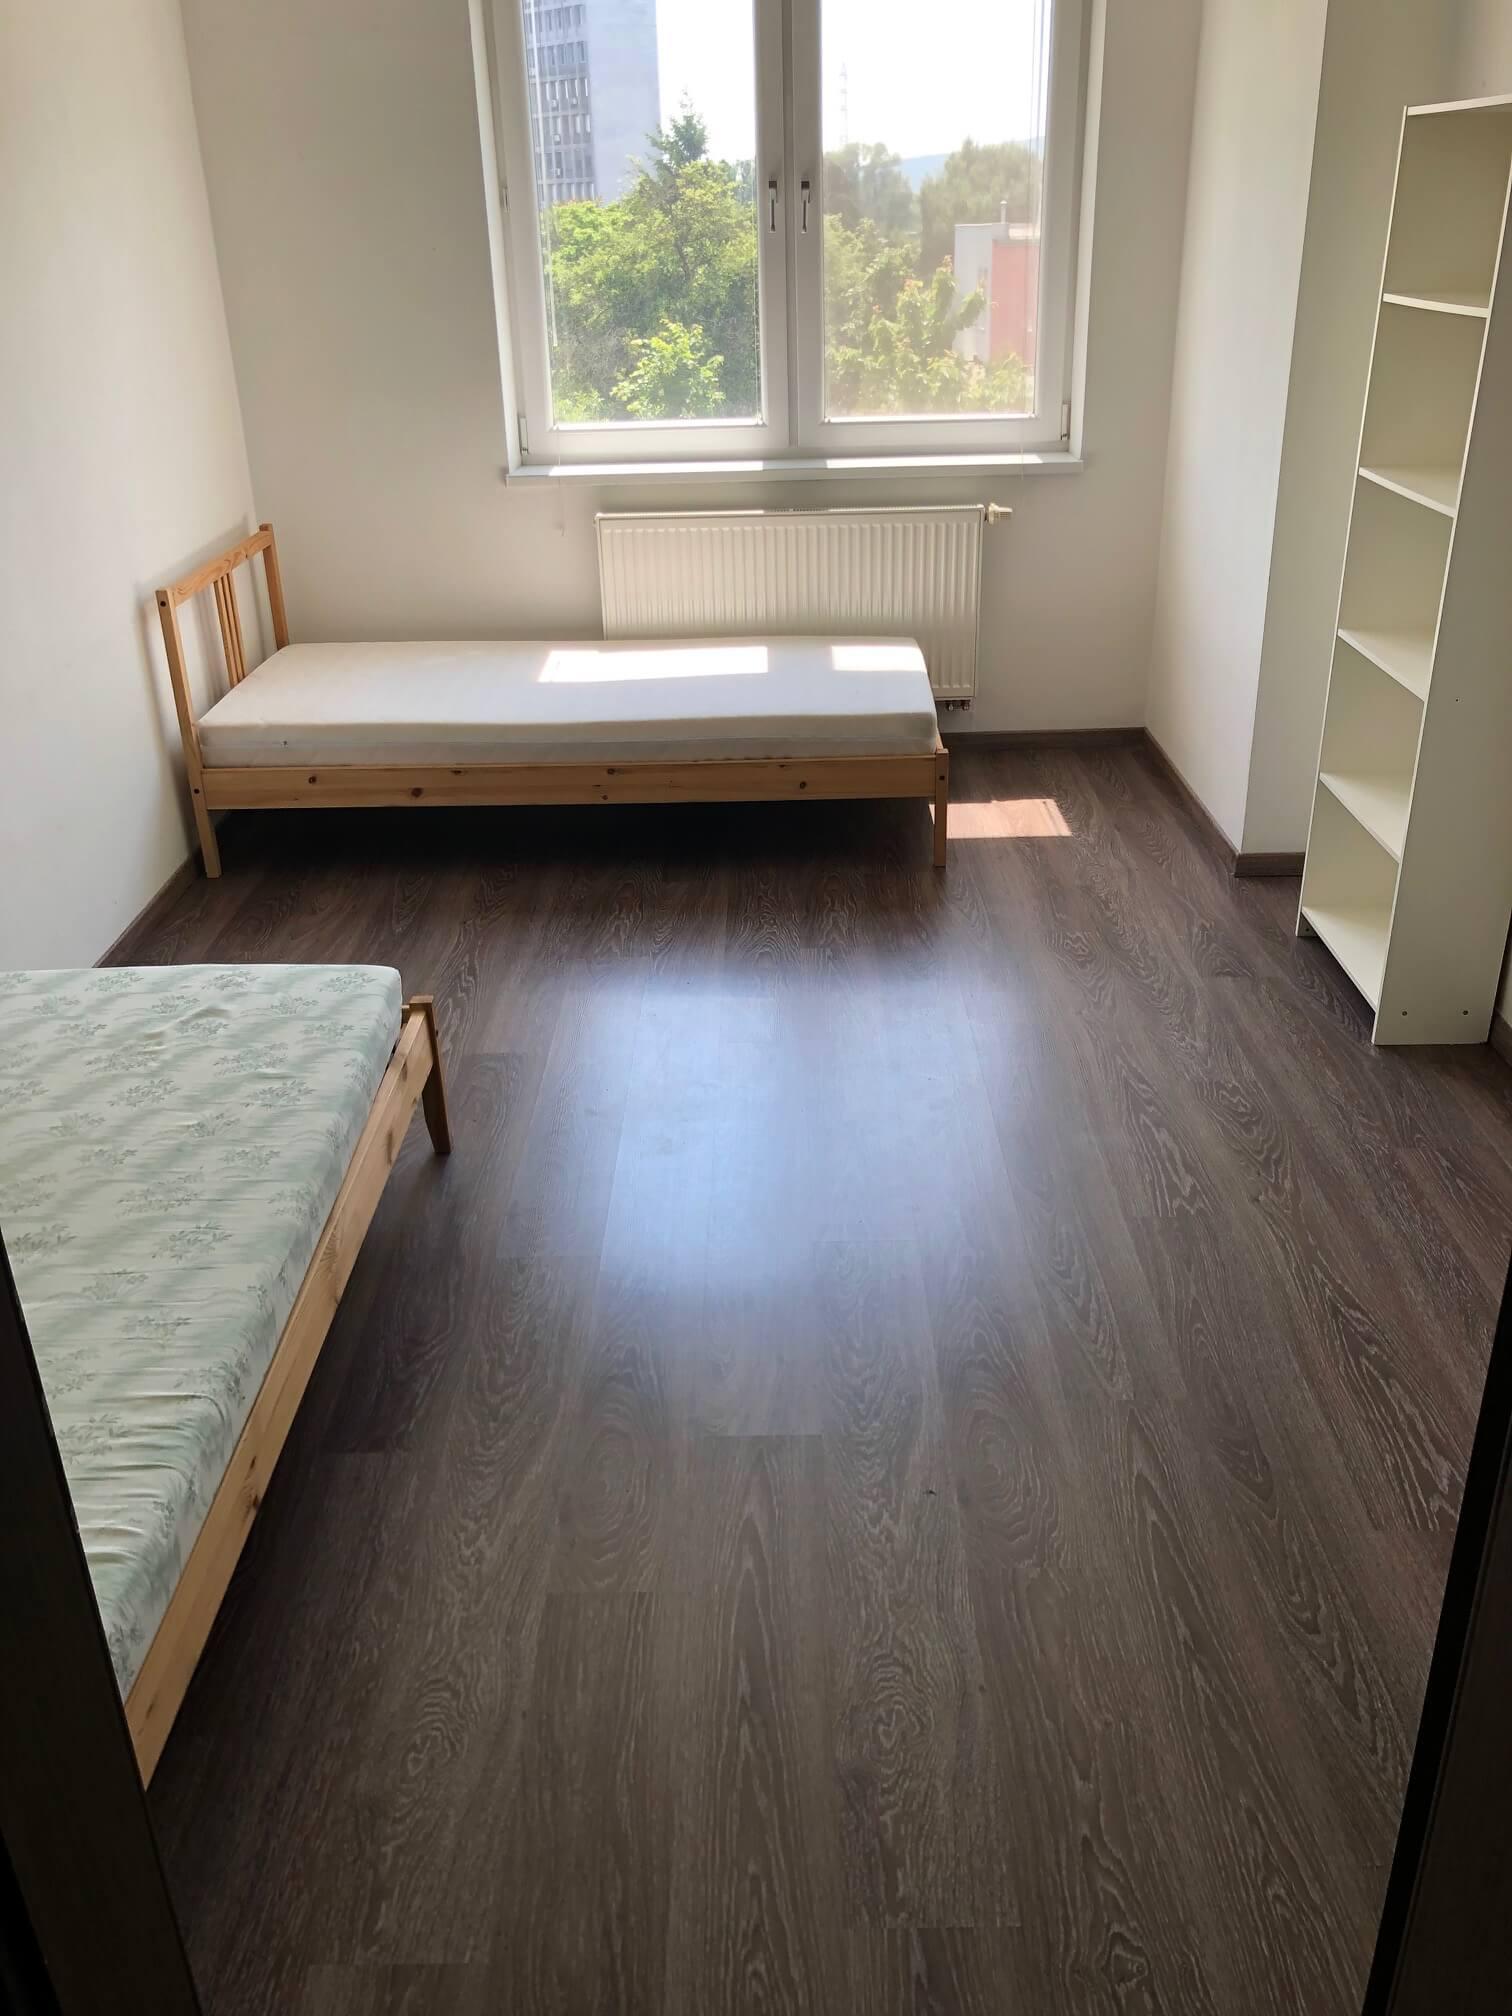 Rezervované: 3 izbový byt, novostavba, 72,25m2, loggia 4,82m2, Staré Grunty, Karlovka, garážové státie-27